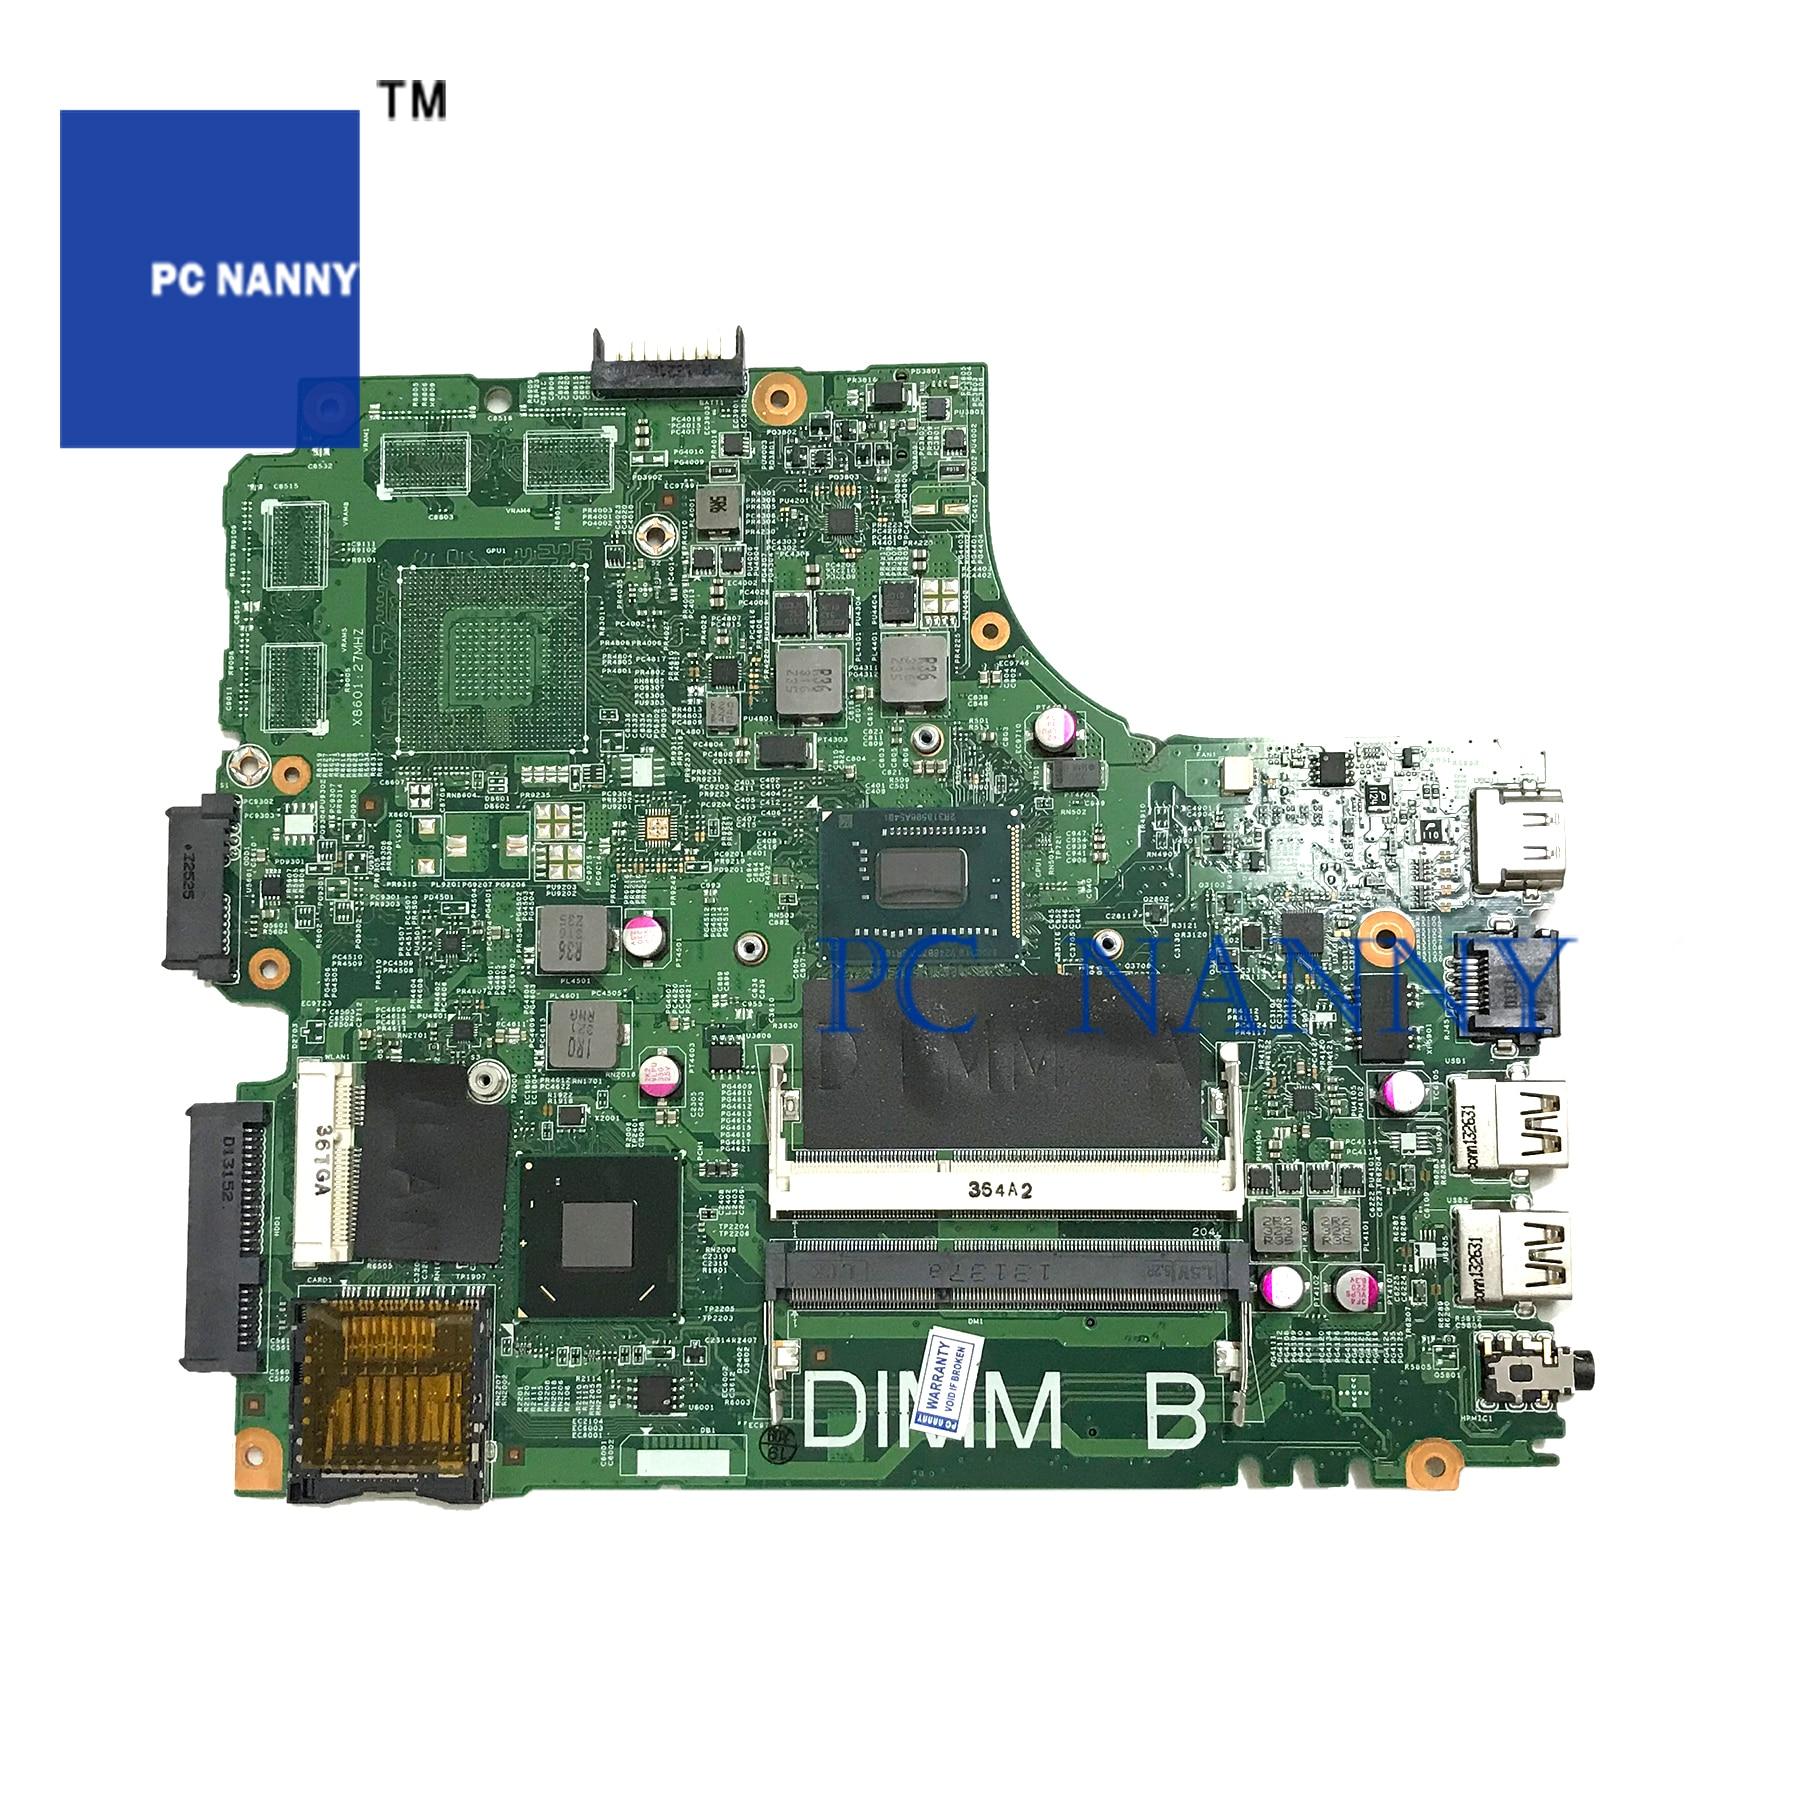 PCNANNY PARA Inspiron 3421 Laptop motherboard 0JK9FM JK9FM 12204-1 SR105 DDR3 2127U CPU testado